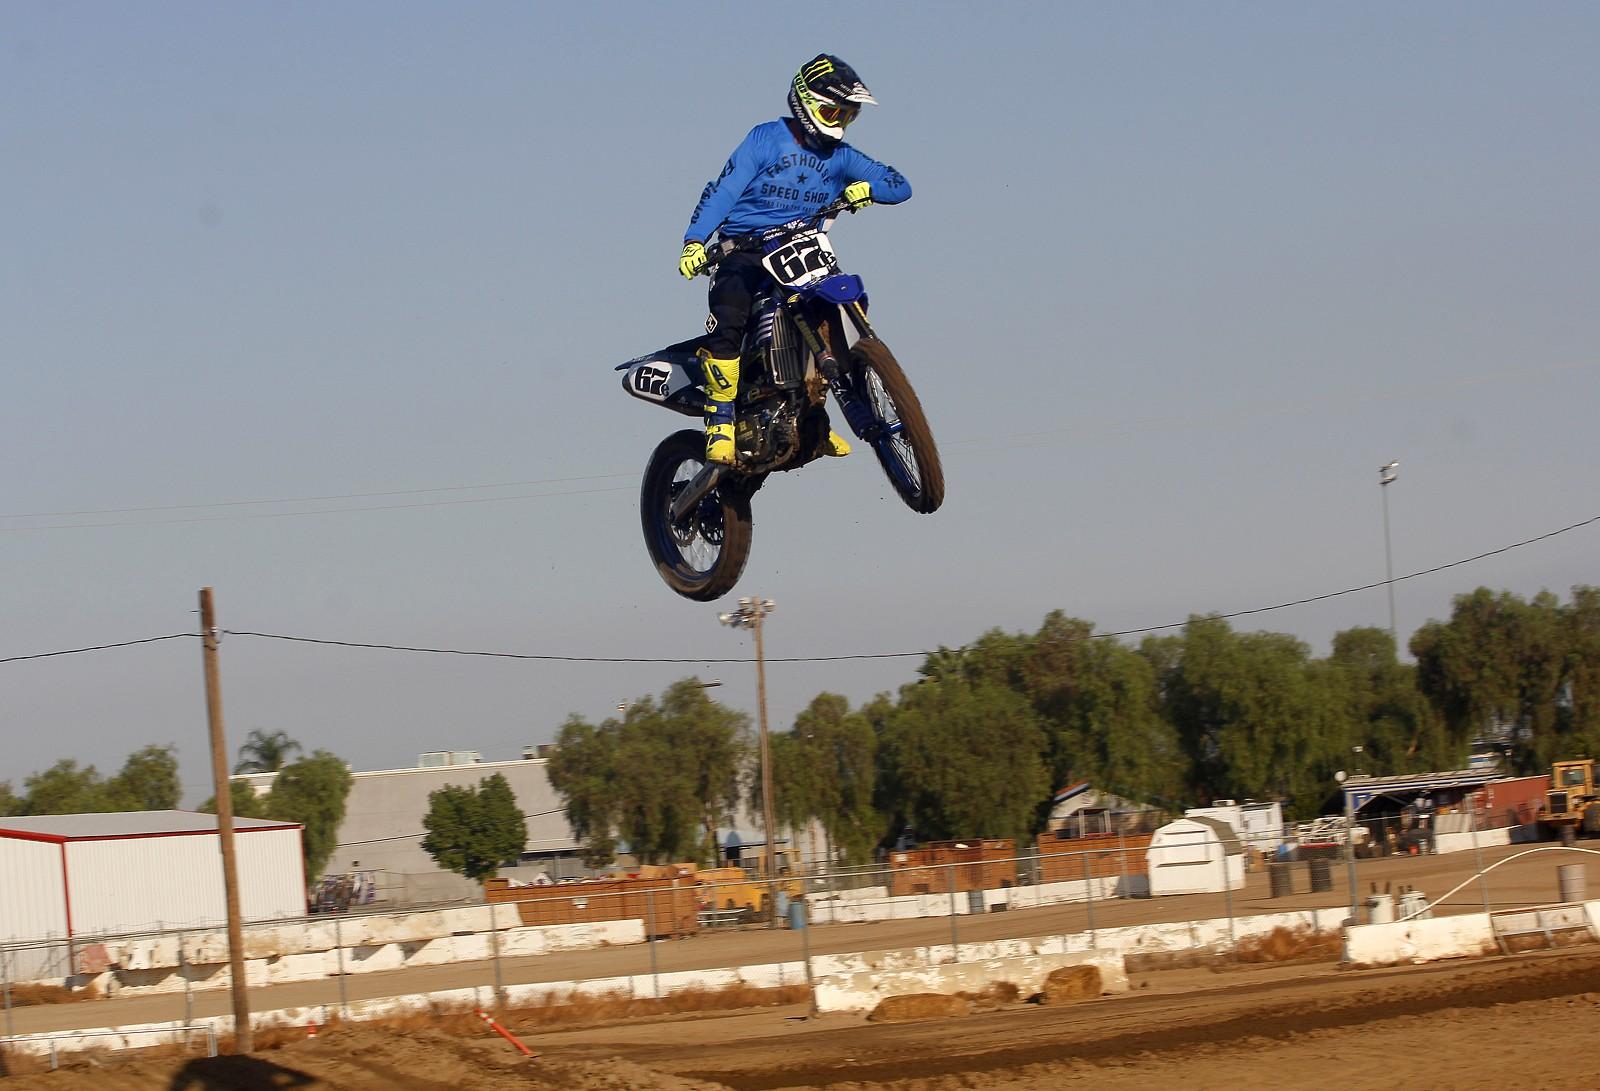 MG 5166 - moto67e - Motocross Pictures - Vital MX